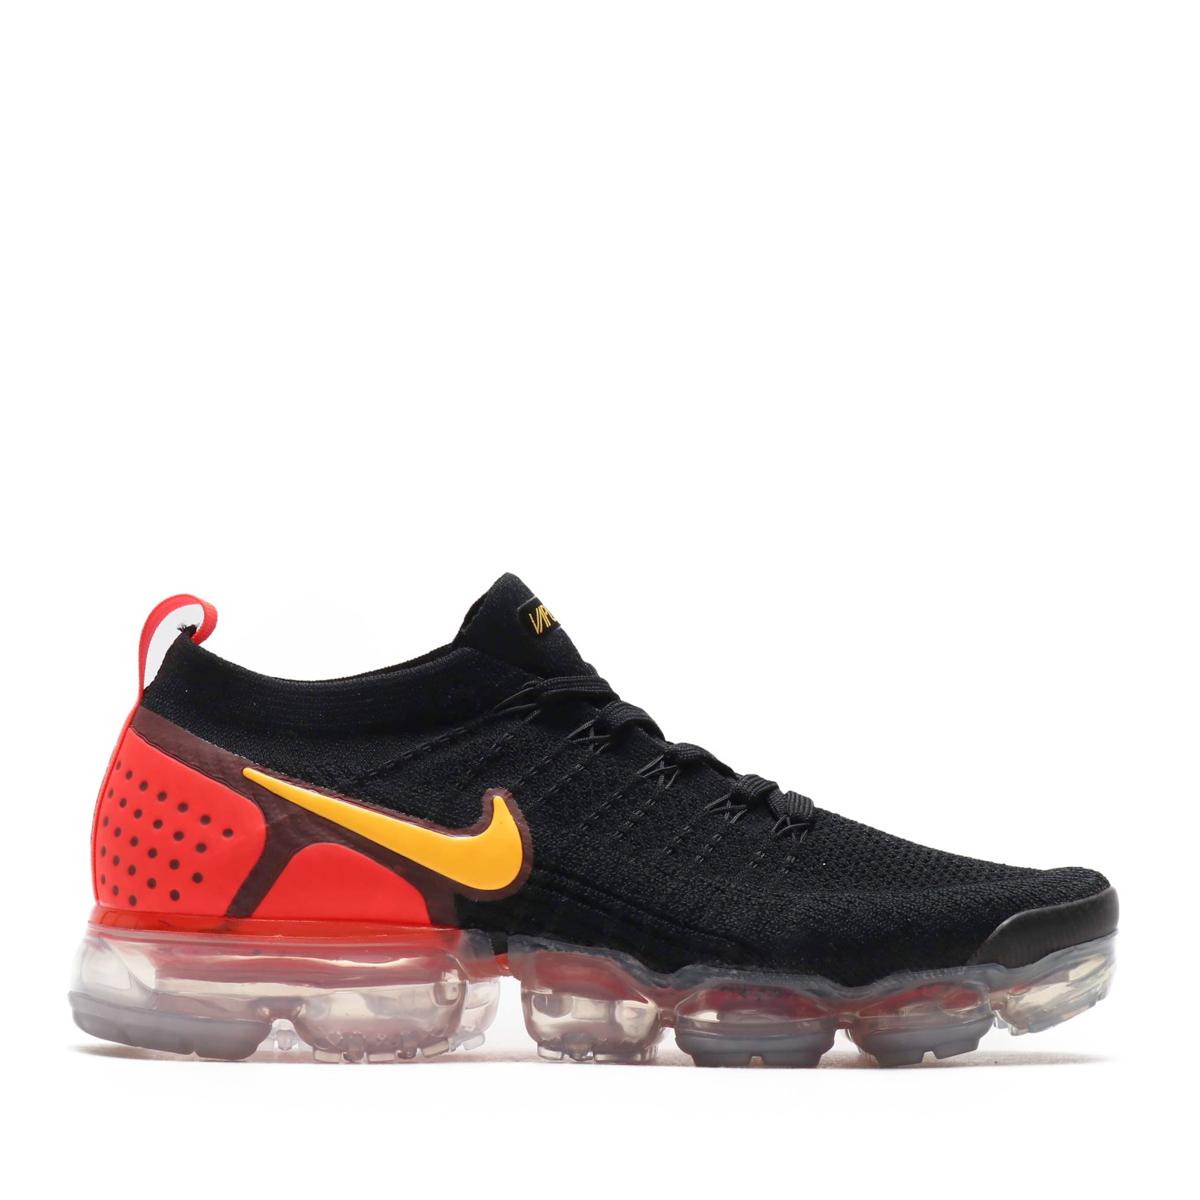 b2842fc1a9d7 NIKE AIR VAPORMAX FLYKNIT 2 (Nike air vapor max fried food knit 2) (BLACK LASER  ORANGE-TOTAL CRIMSON)